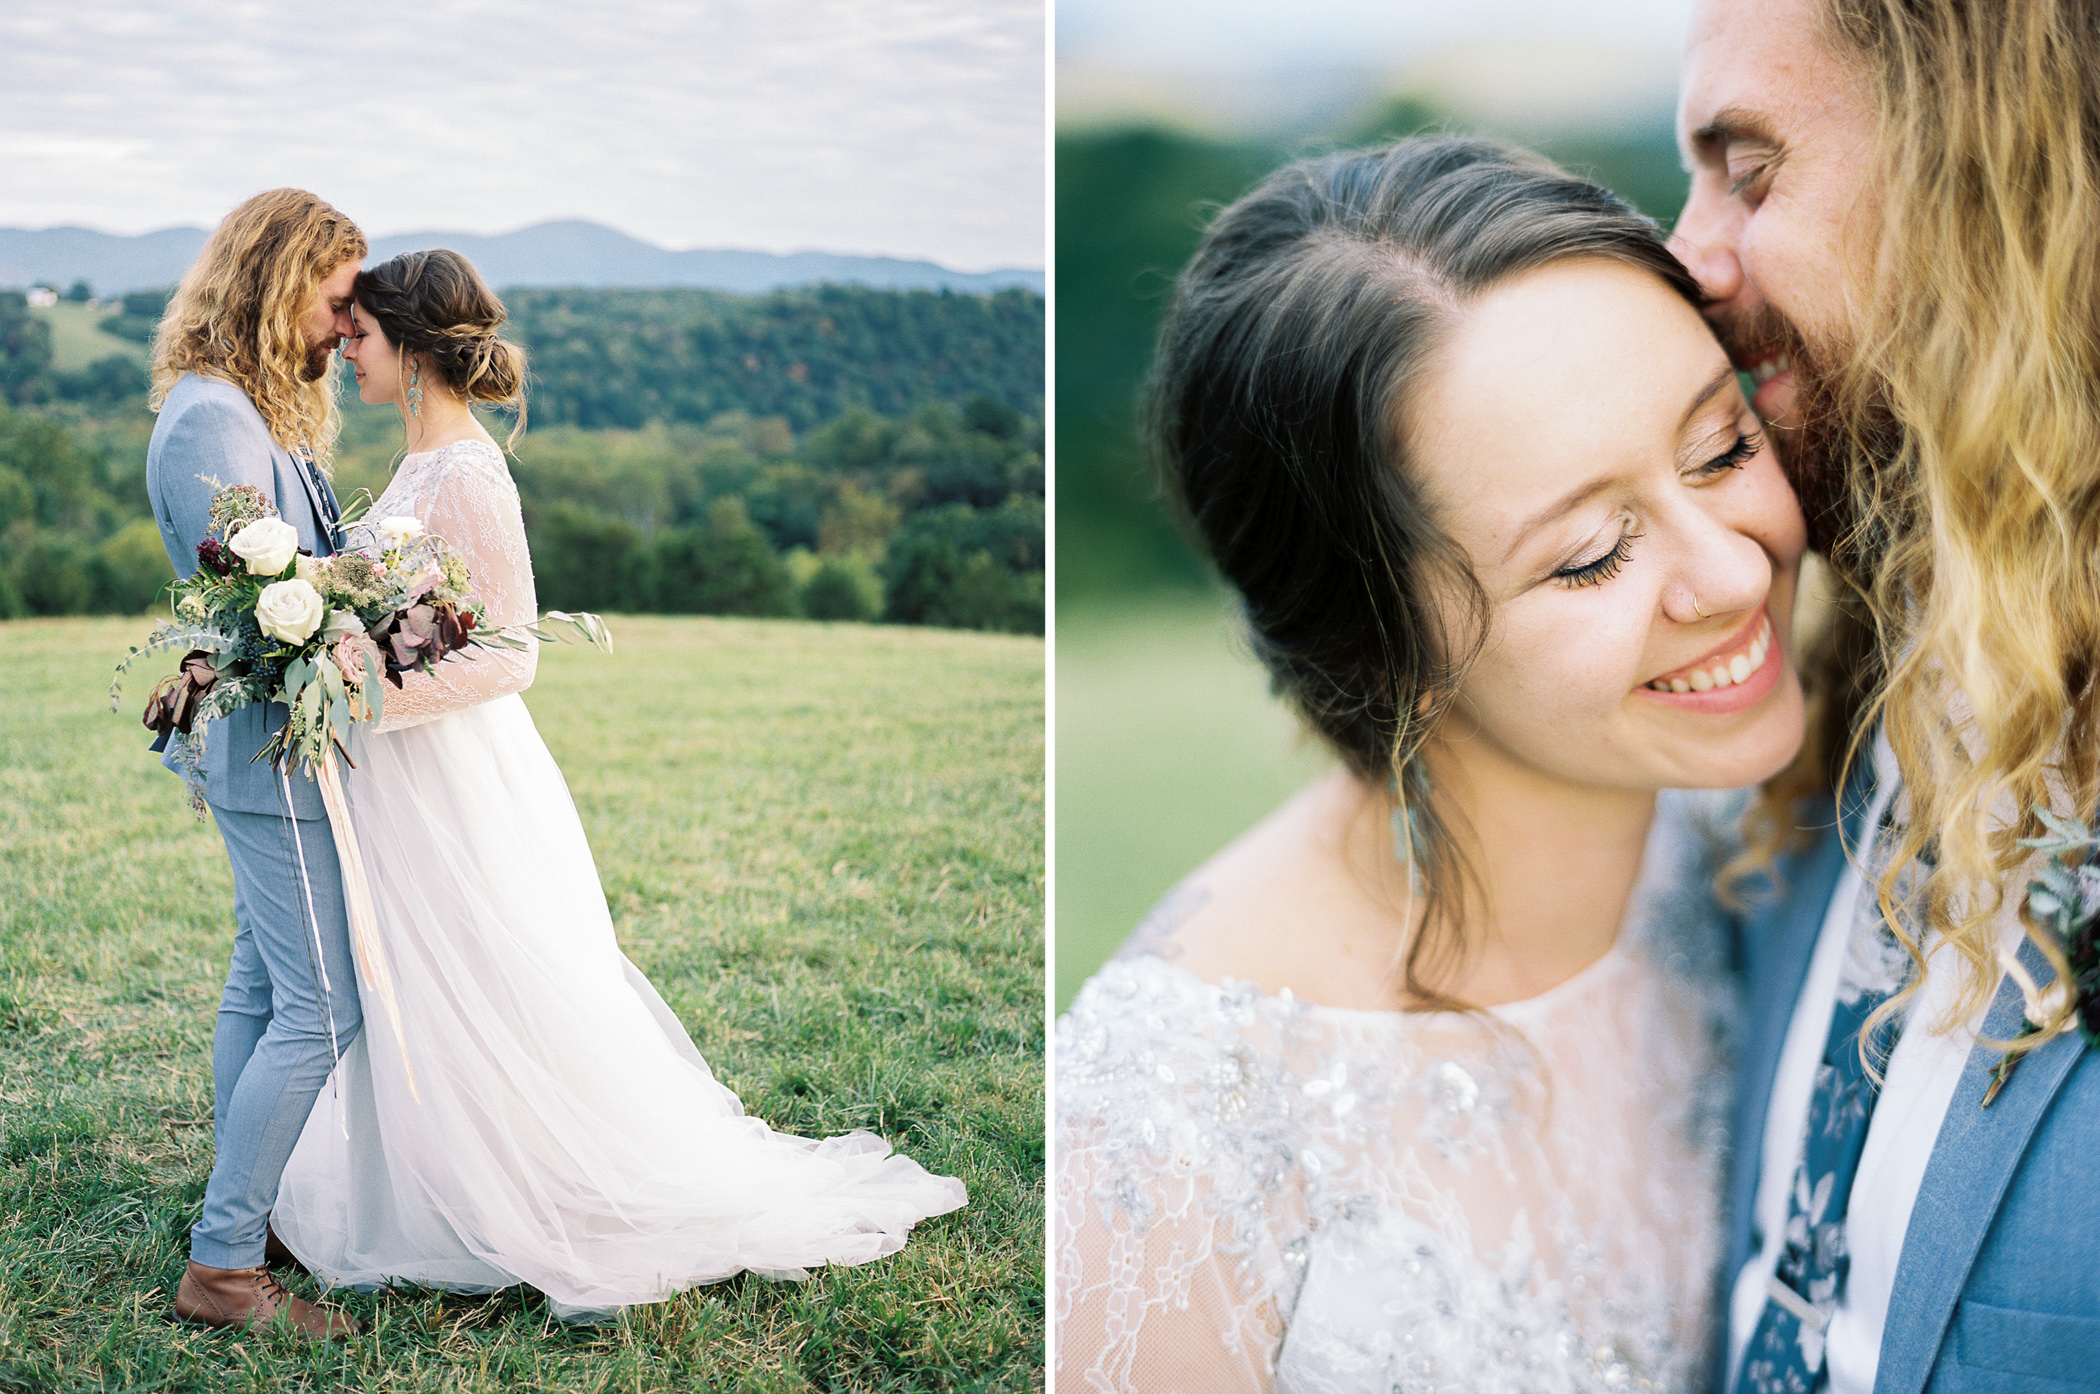 Charlotte-Film-Wedding_Photographer-heartstone-lodge-virginia-34.jpg